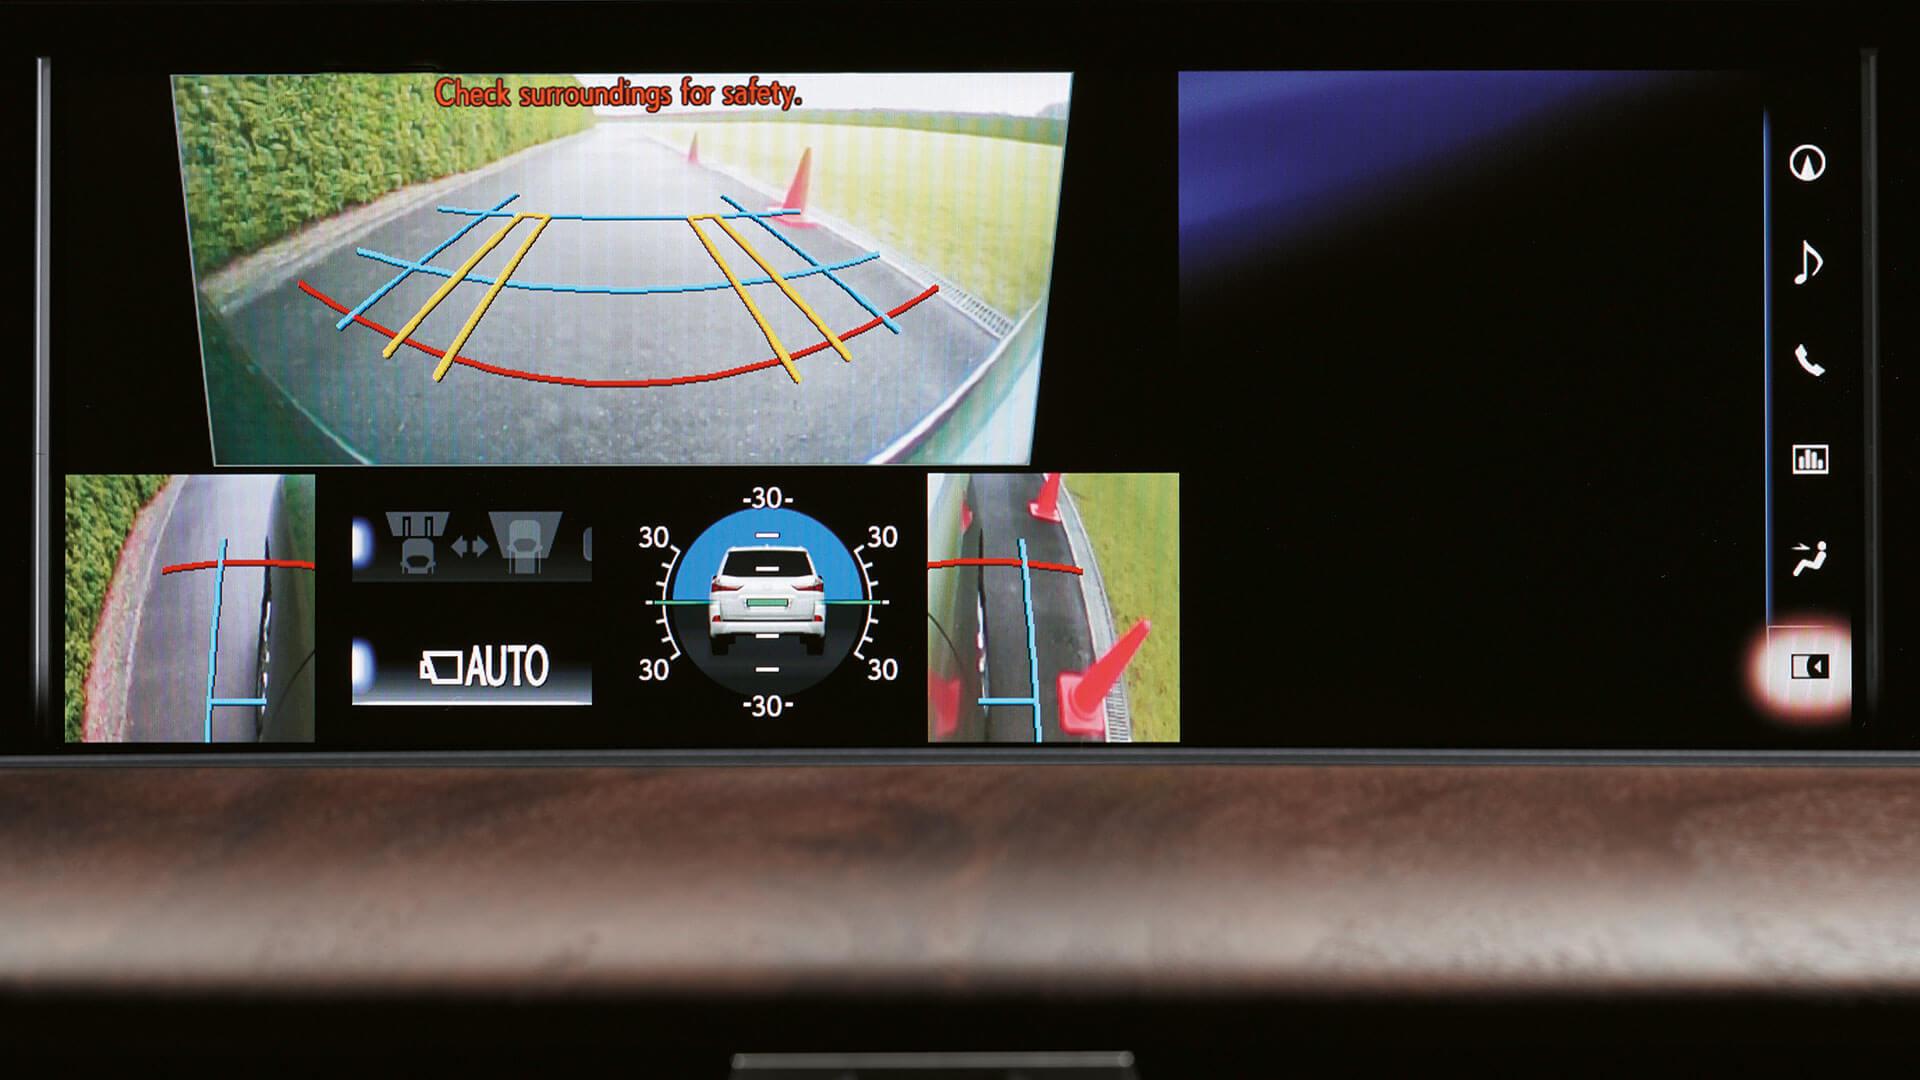 2018 lexus lx feature parking assist monitor